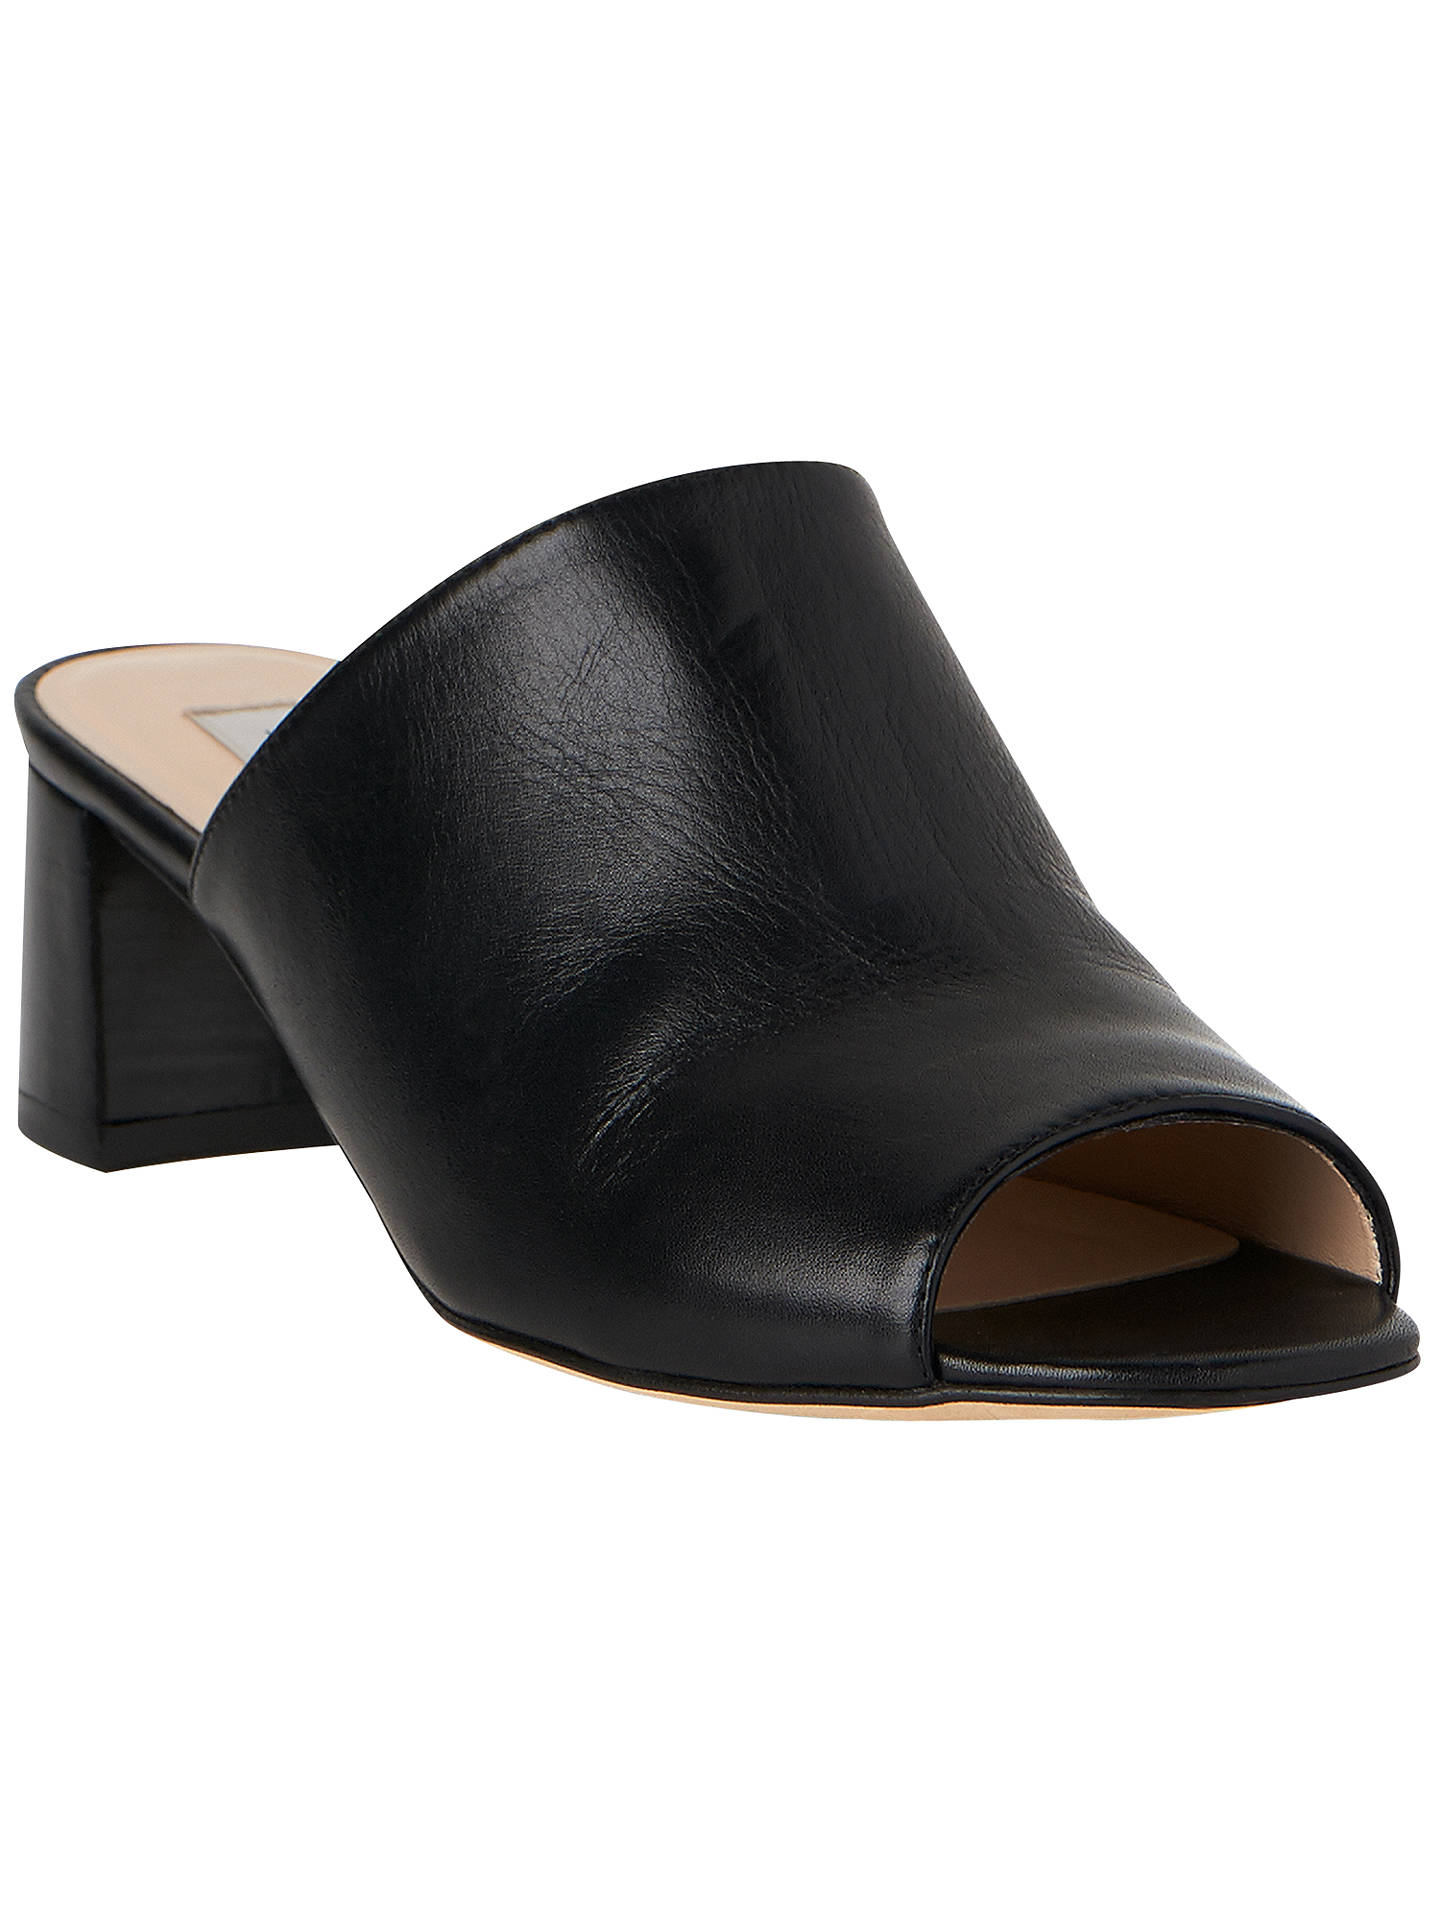 d0431d195d6 L.K. Bennett Dana Block Heeled Mule Sandals, Black Leather at John ...